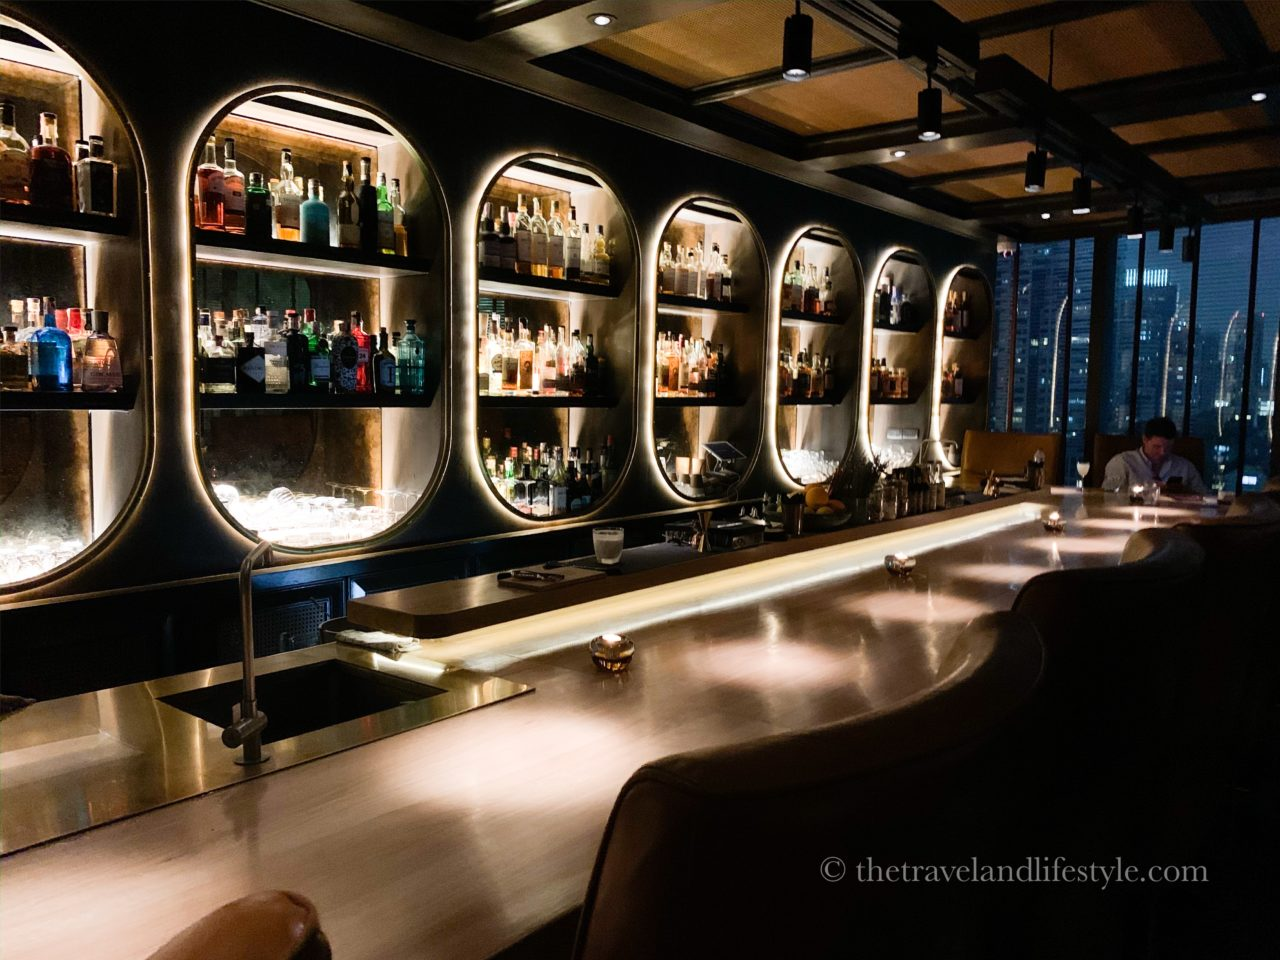 img 8546 - akyra Thonglor Bangkok -  バンコクのラグジュアリーデザイナーズホテル